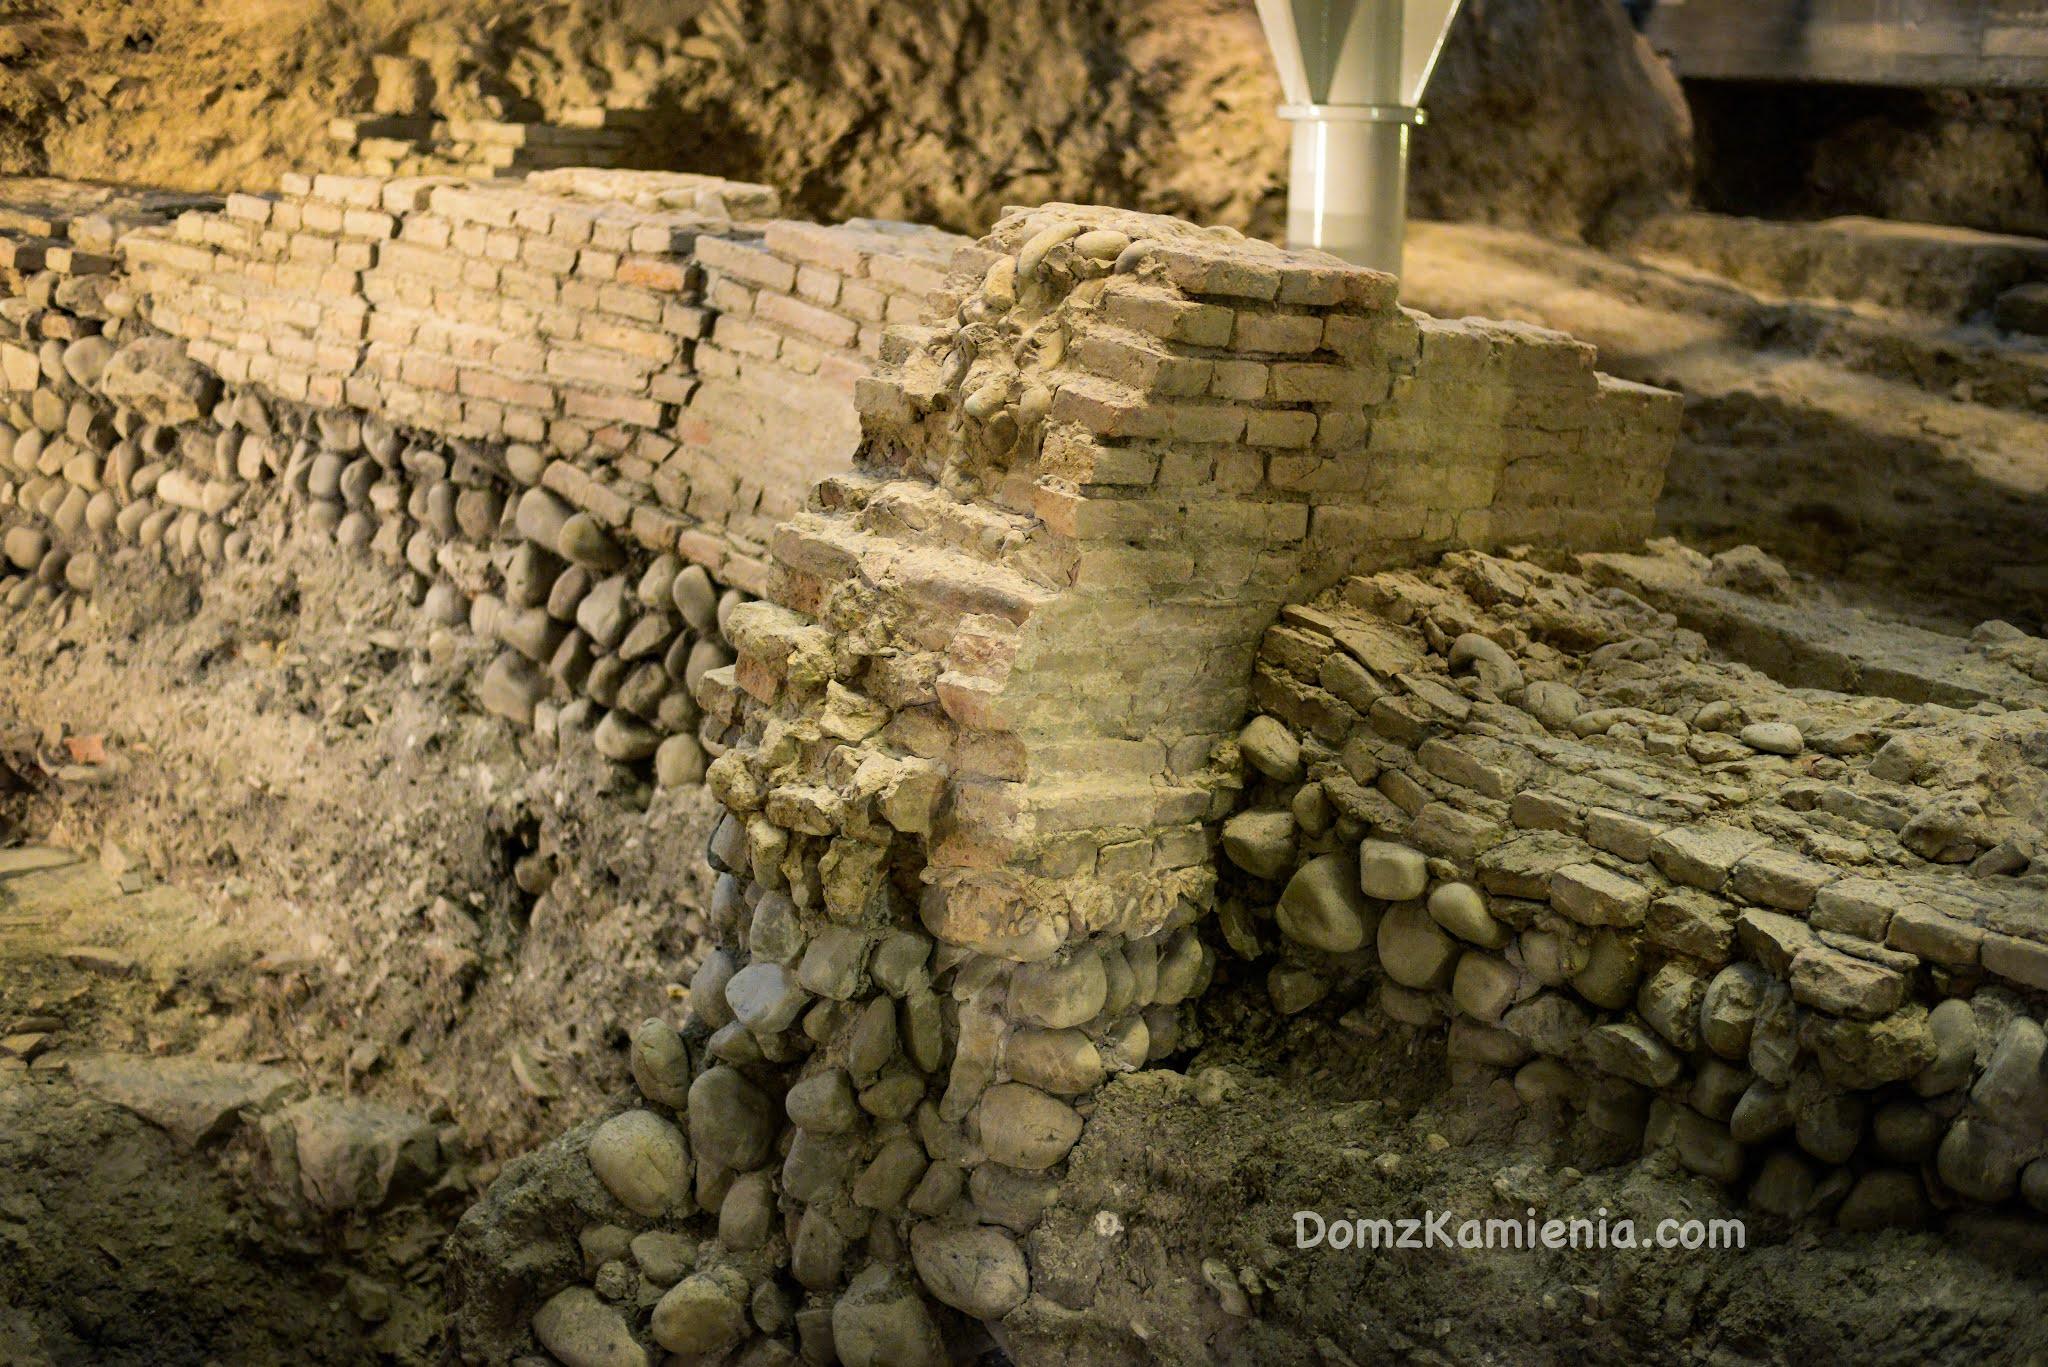 Dom z Kamienia blog, Bolonia Sala Borsa